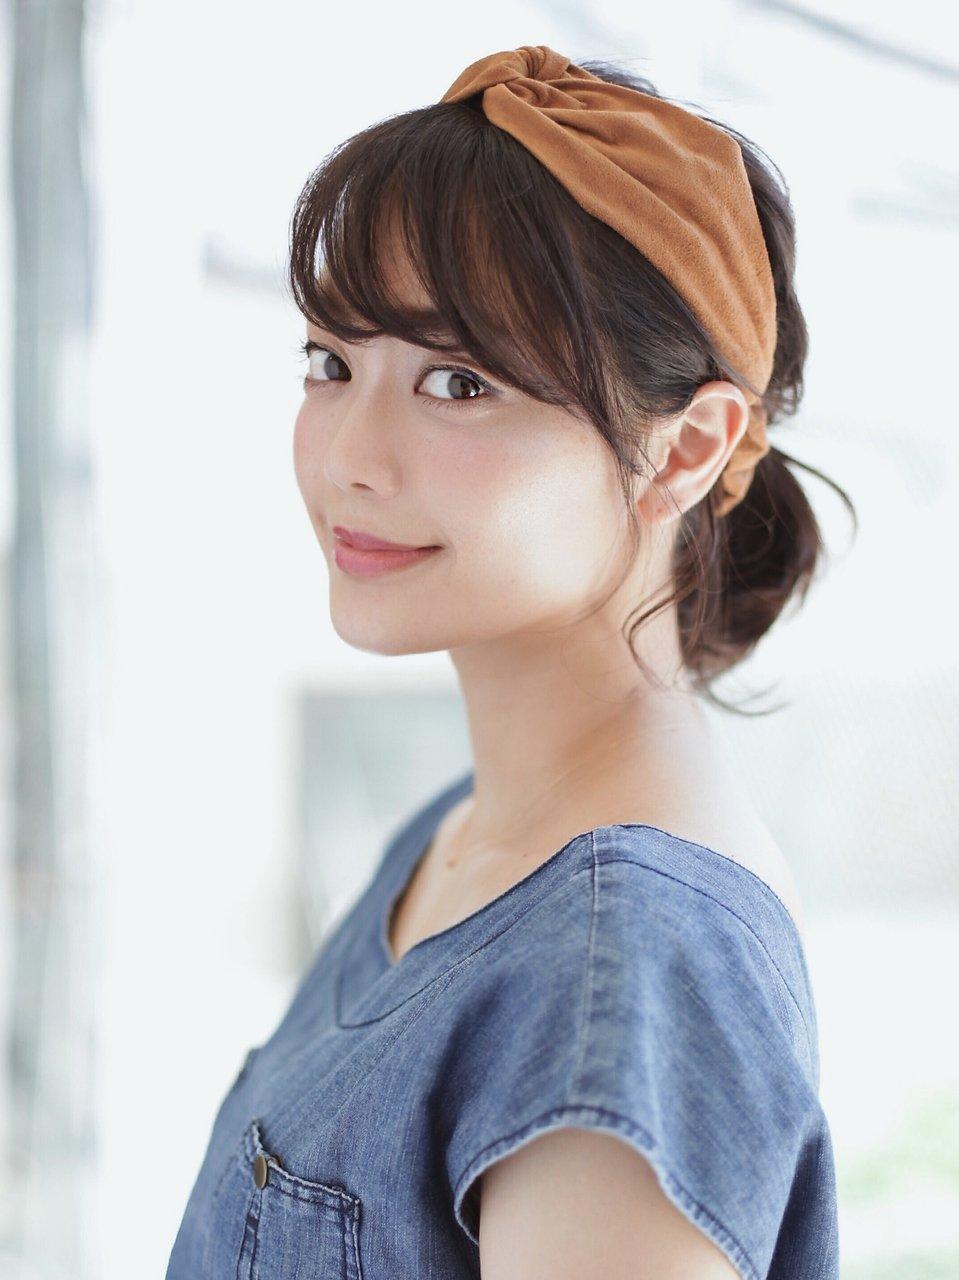 HOULe【大西絢子】2016 リラクシー小顔ボブ×ターバンアレンジ